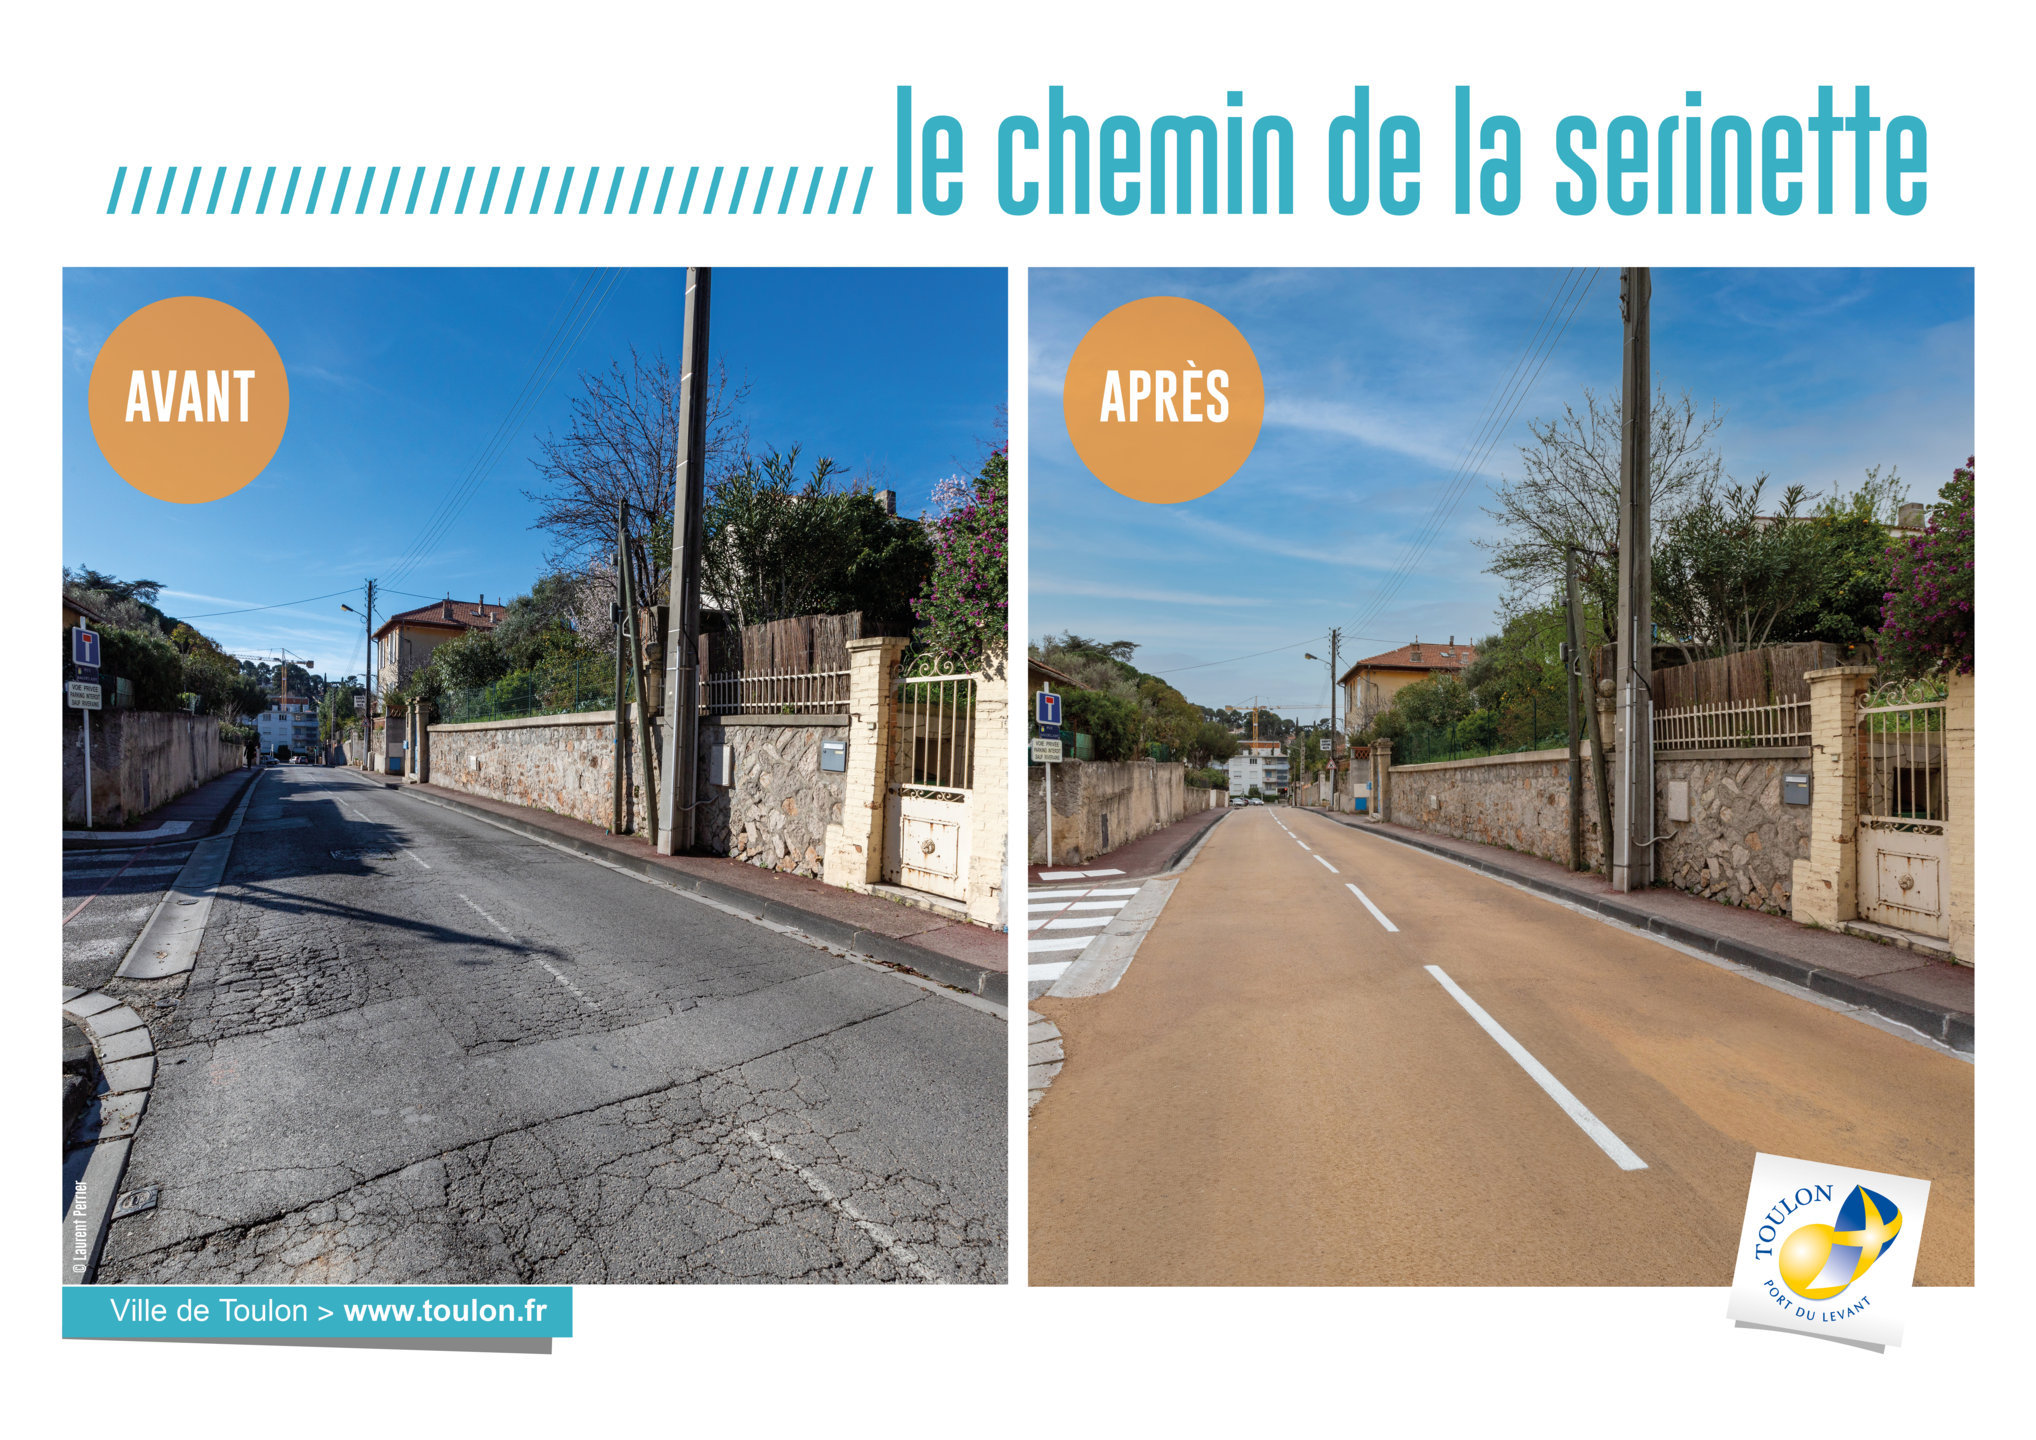 L'Avenue de la Serinette